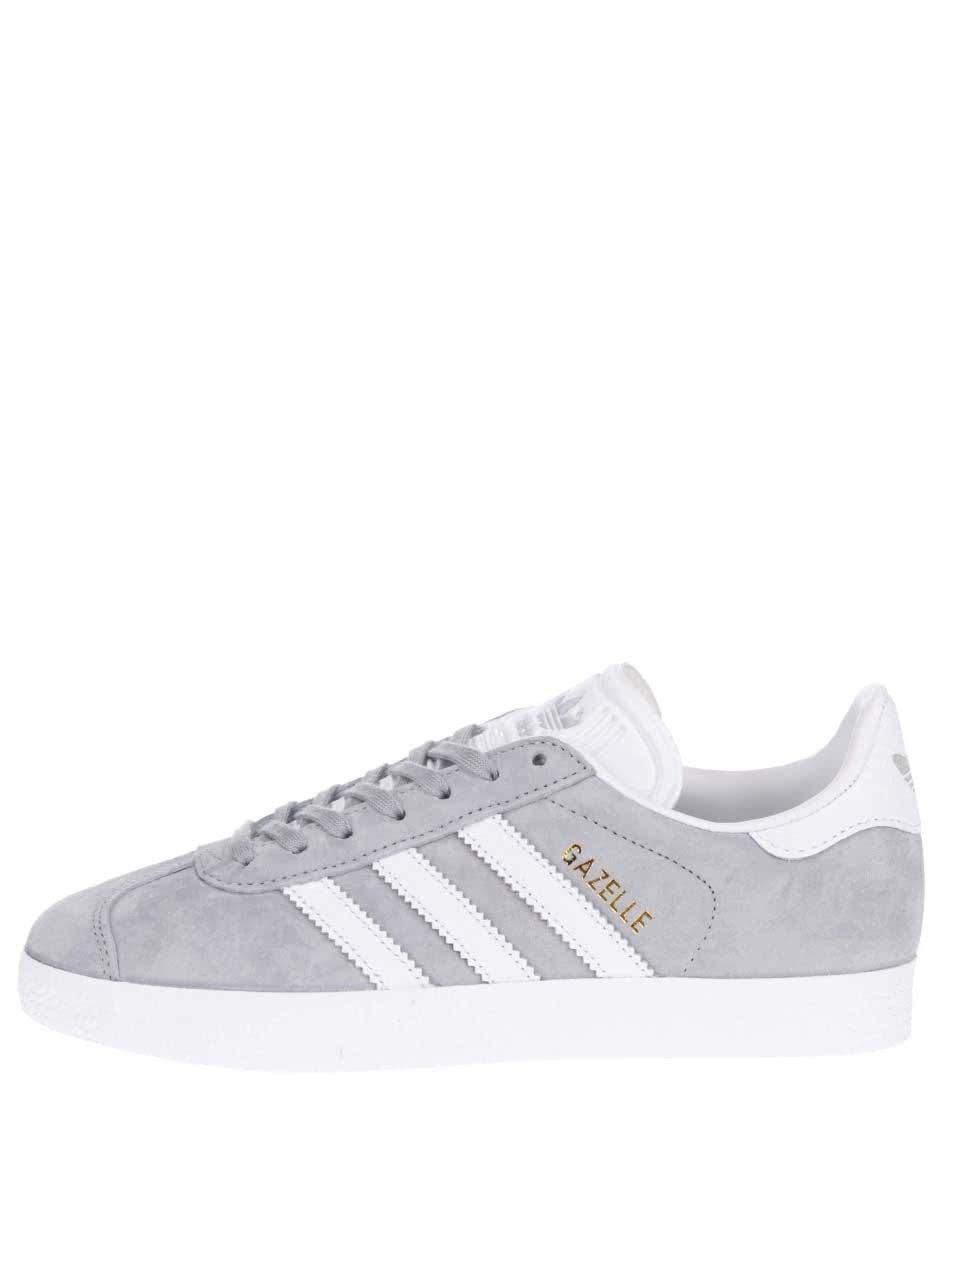 00aeb234e1b4 Bielo-sivé dámske tenisky Bílo-šedé dámské tenisky adidas Originals Gazelle  ...